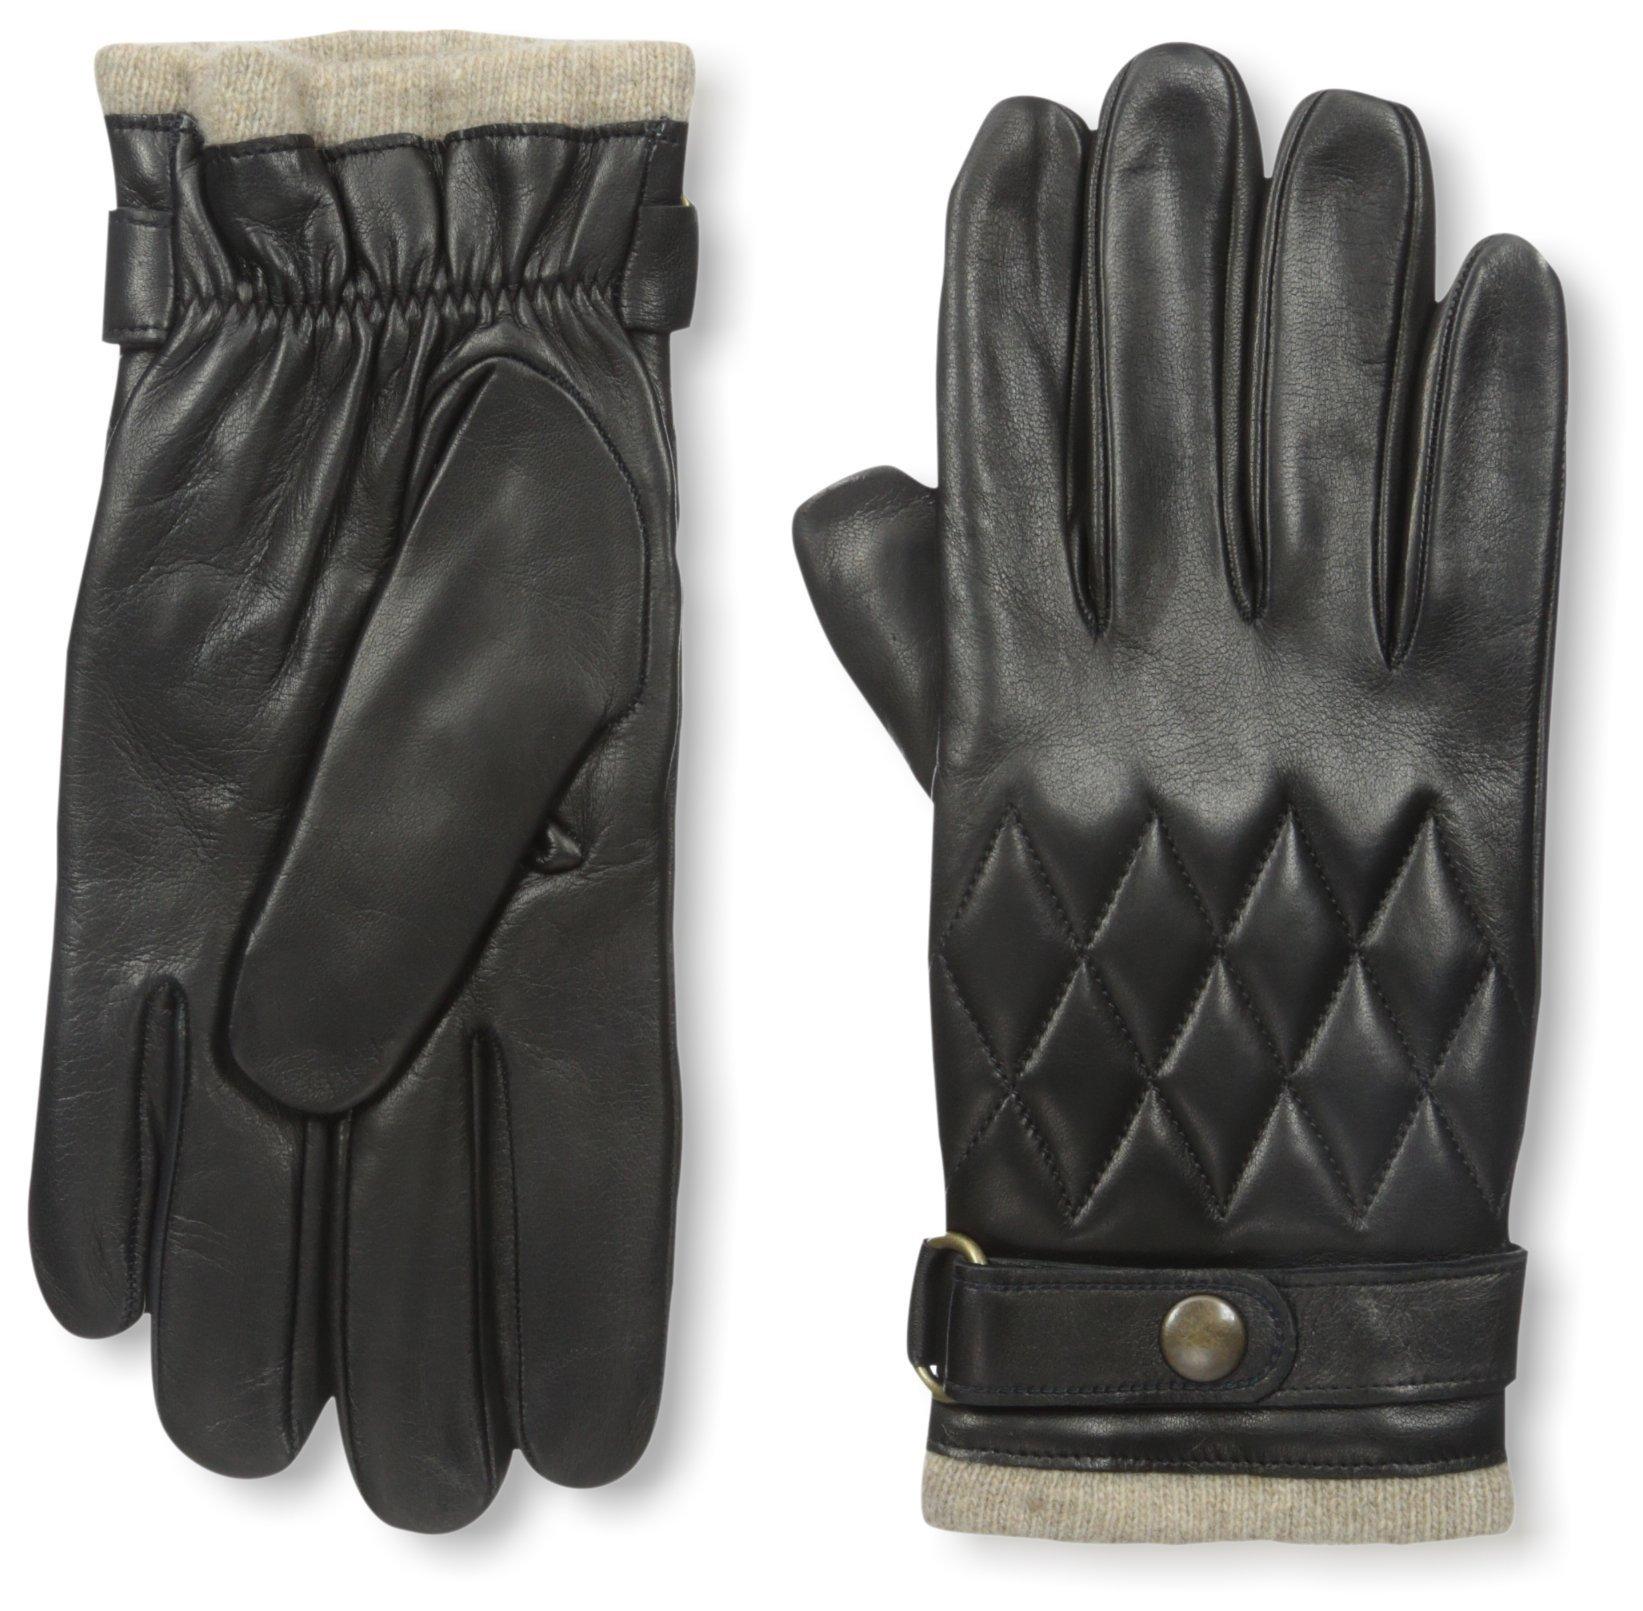 Franklin Tailored Men's Nappa Snap Closure Glove, Black, M